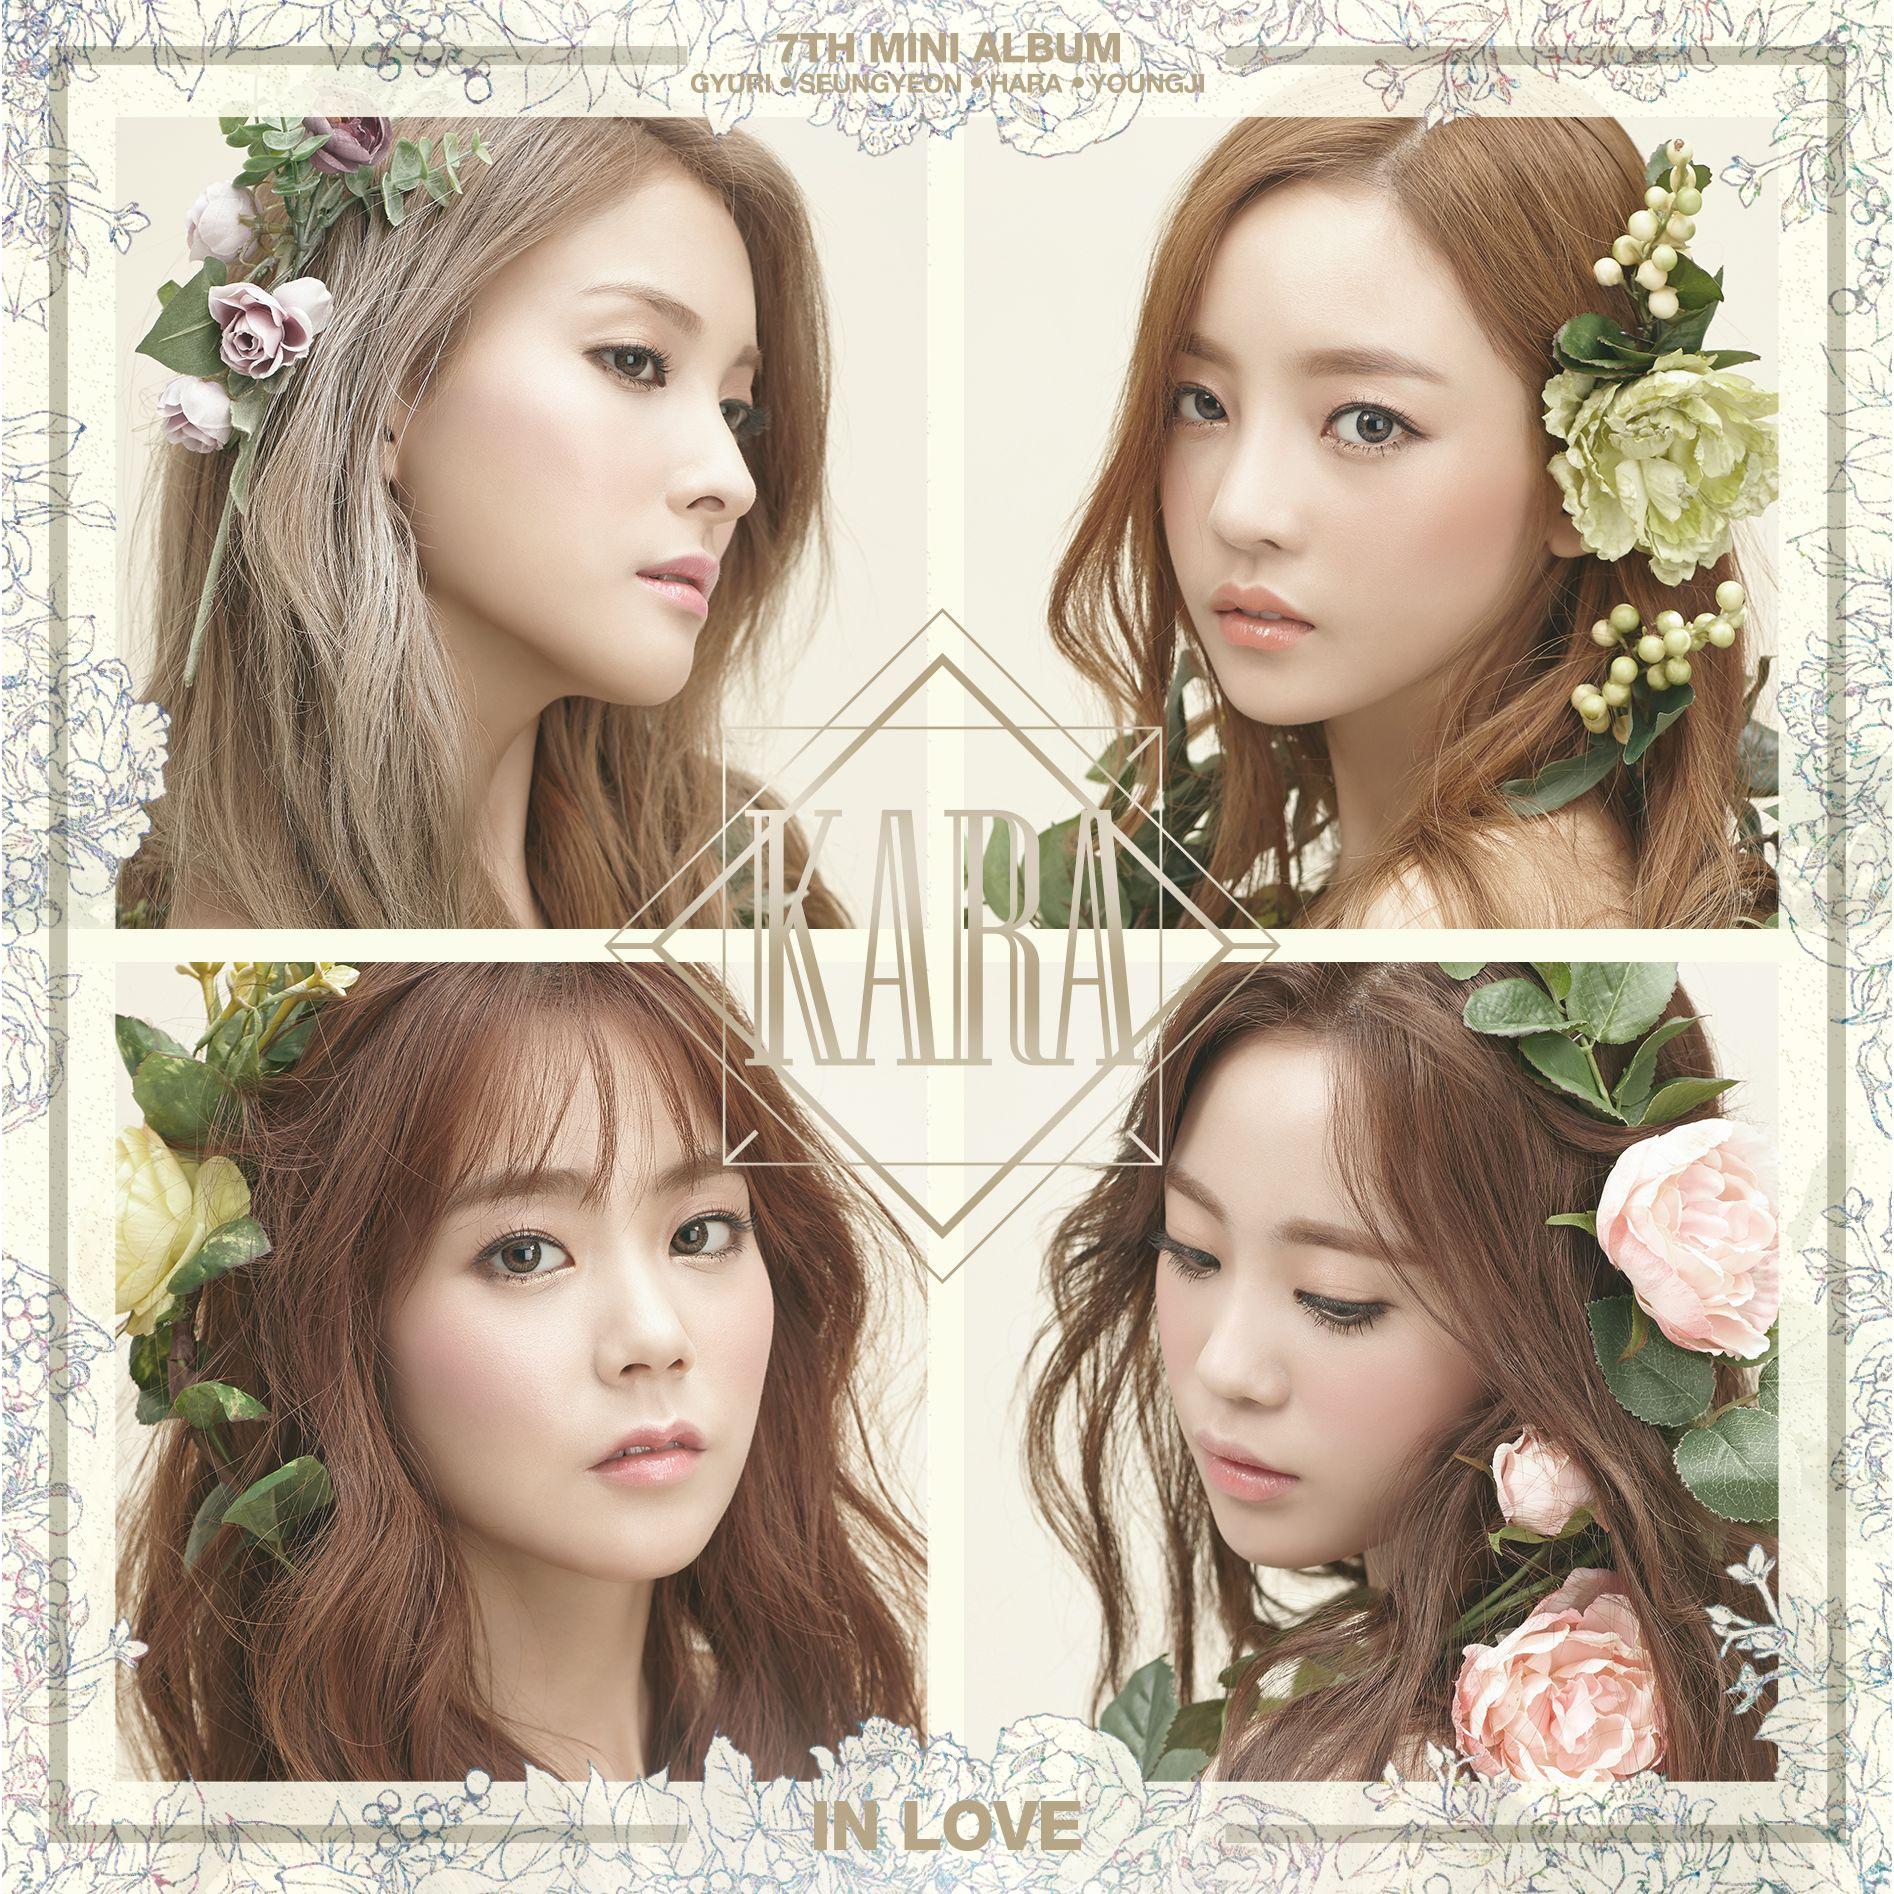 [KARA] 7th Mini Album `In Love`